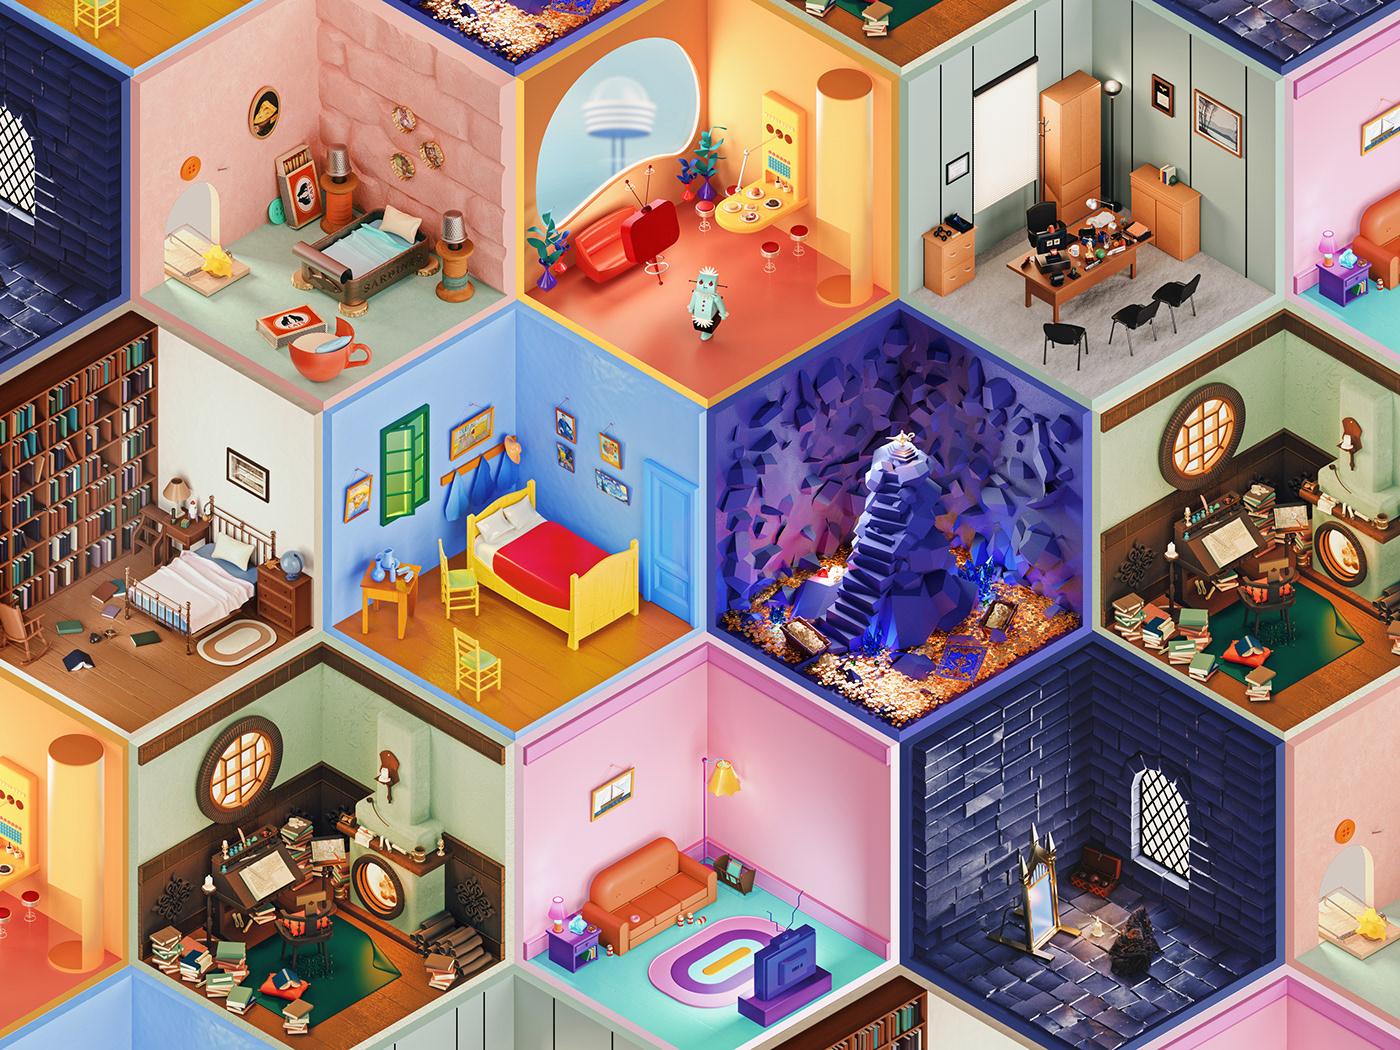 Image may contain: cartoon, indoor and wall